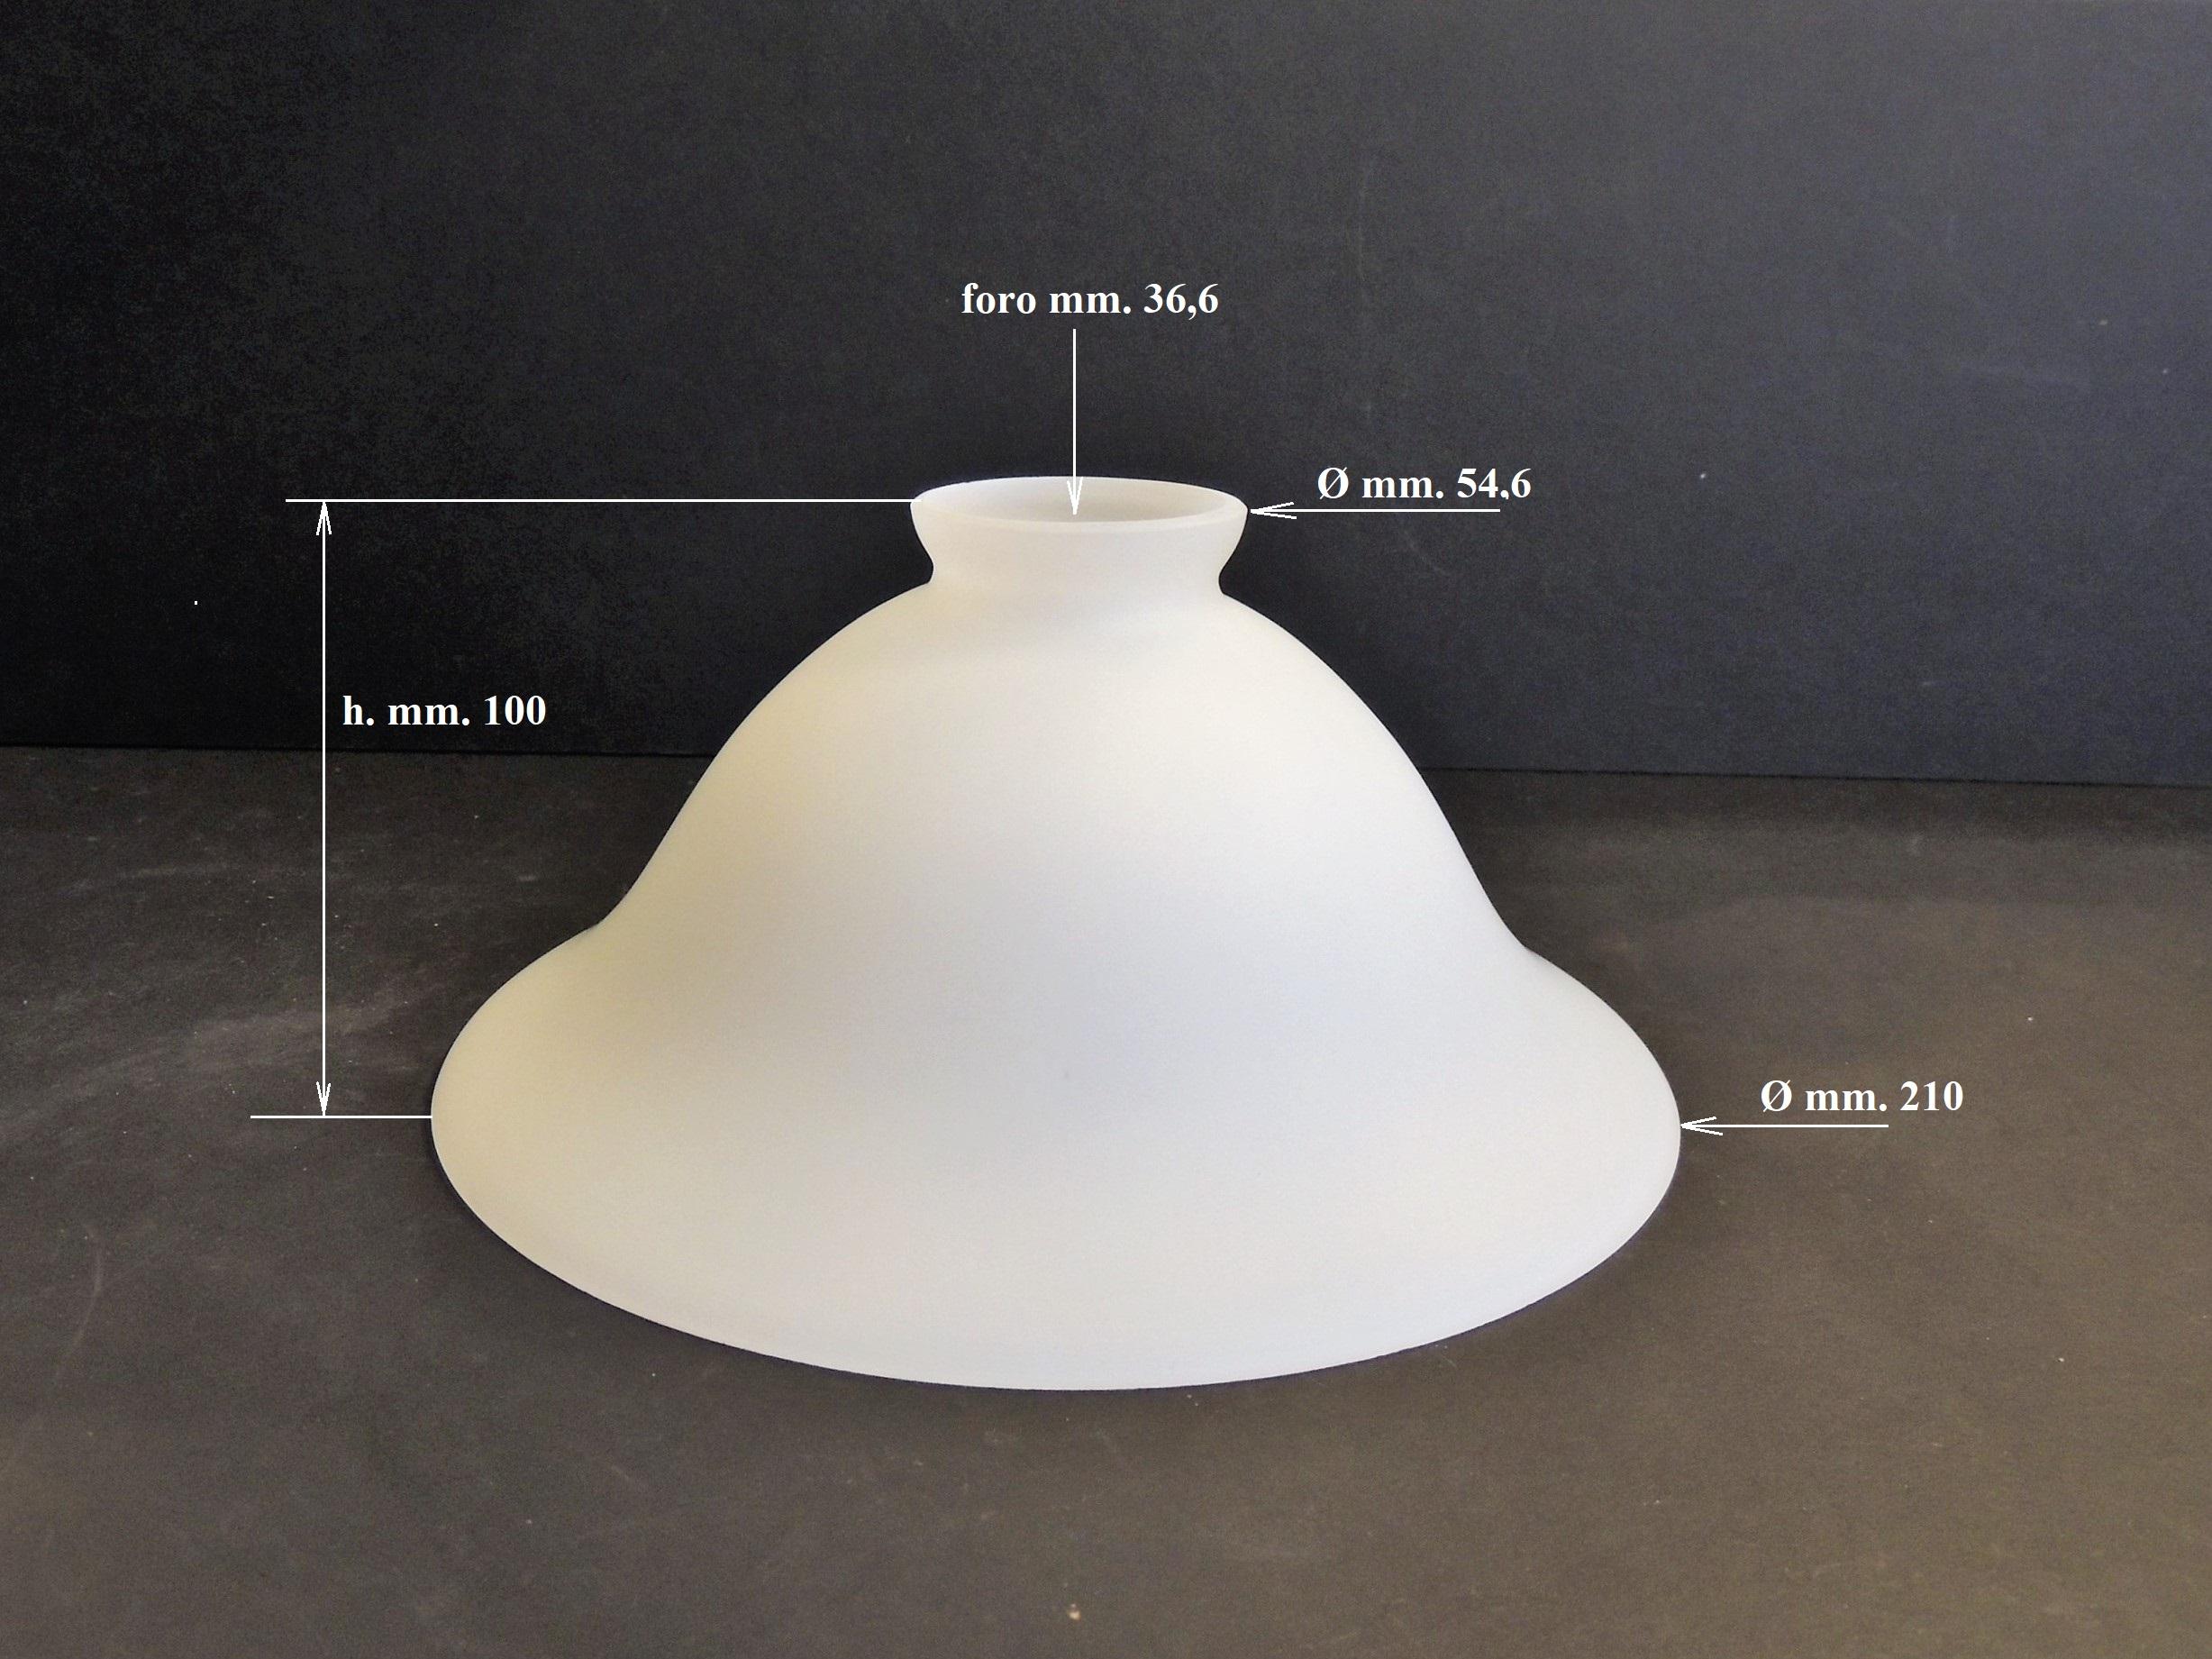 Plafoniere In Vetro Per Lampadari : Ricambi vetri di ricambio per lampadari rossi illuminazione vicenza